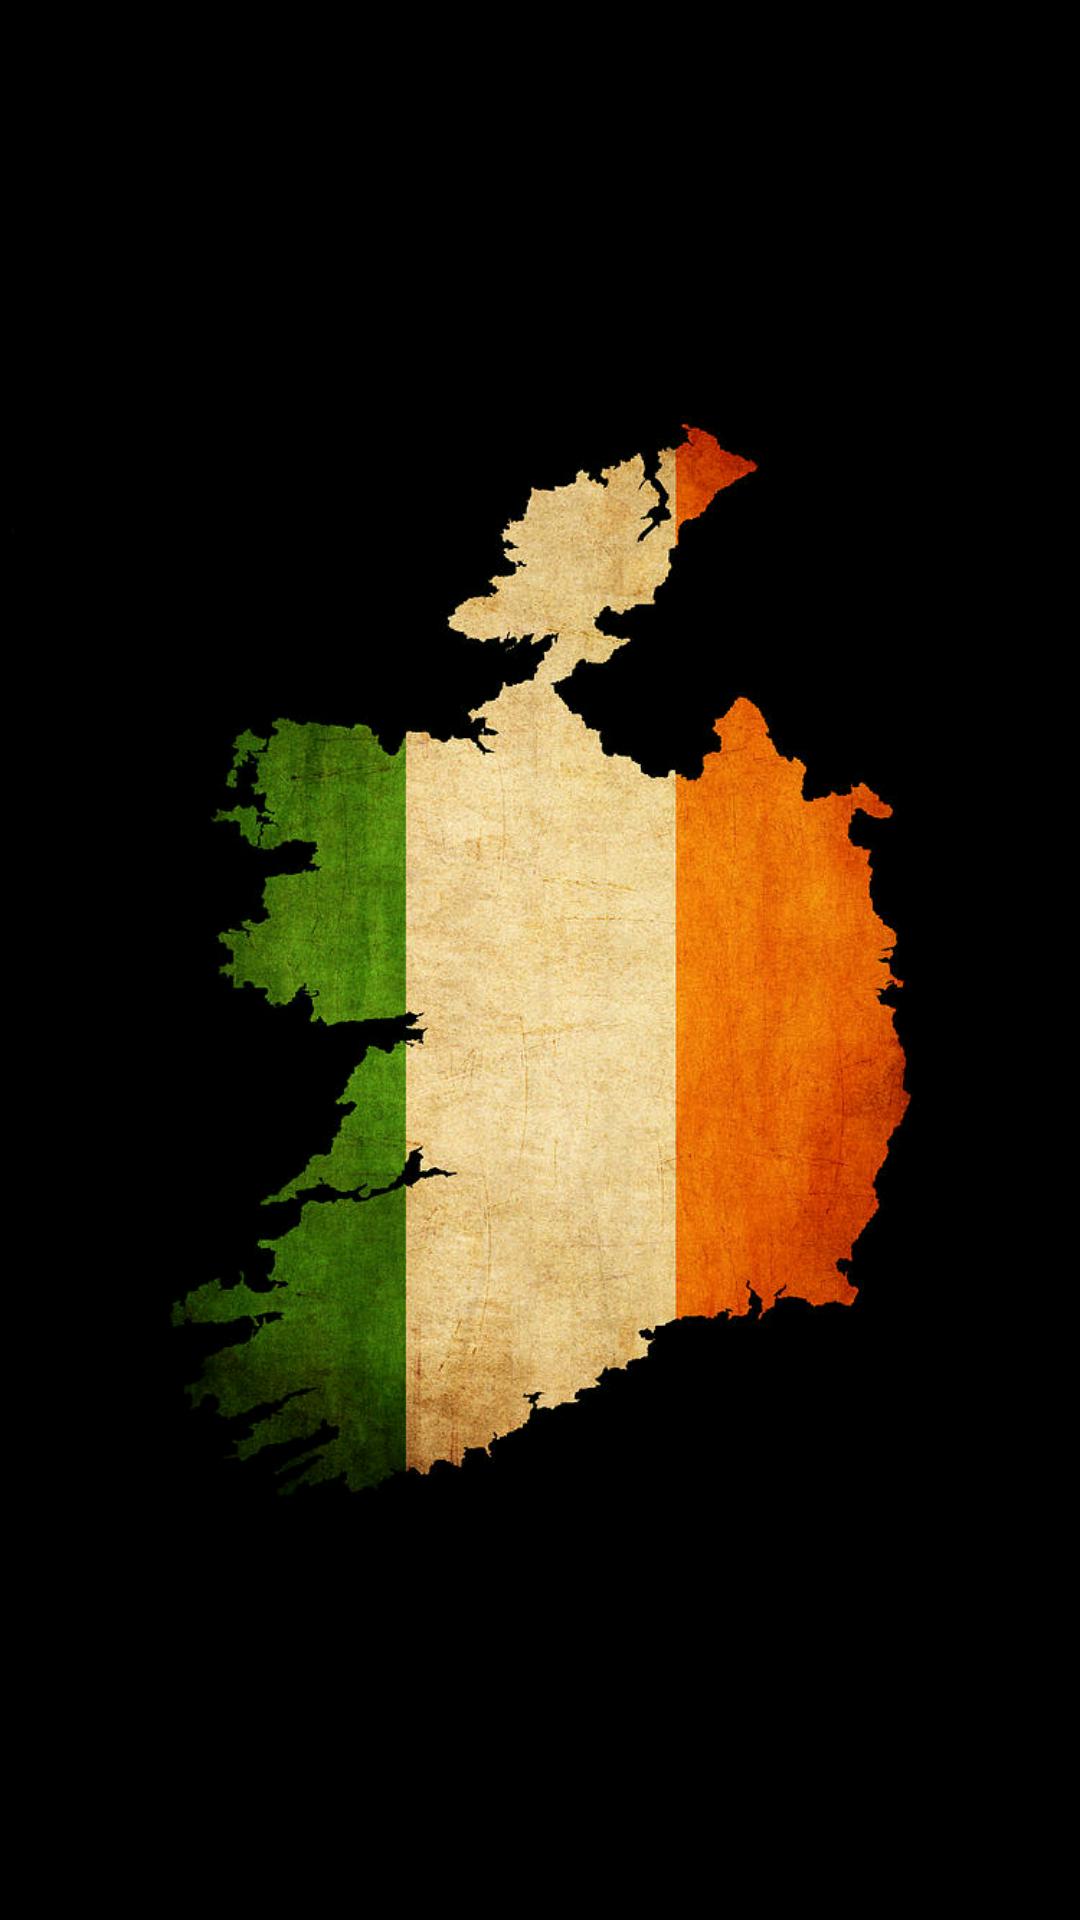 Ireland wallpaper   Album on Imgur 1080x1920